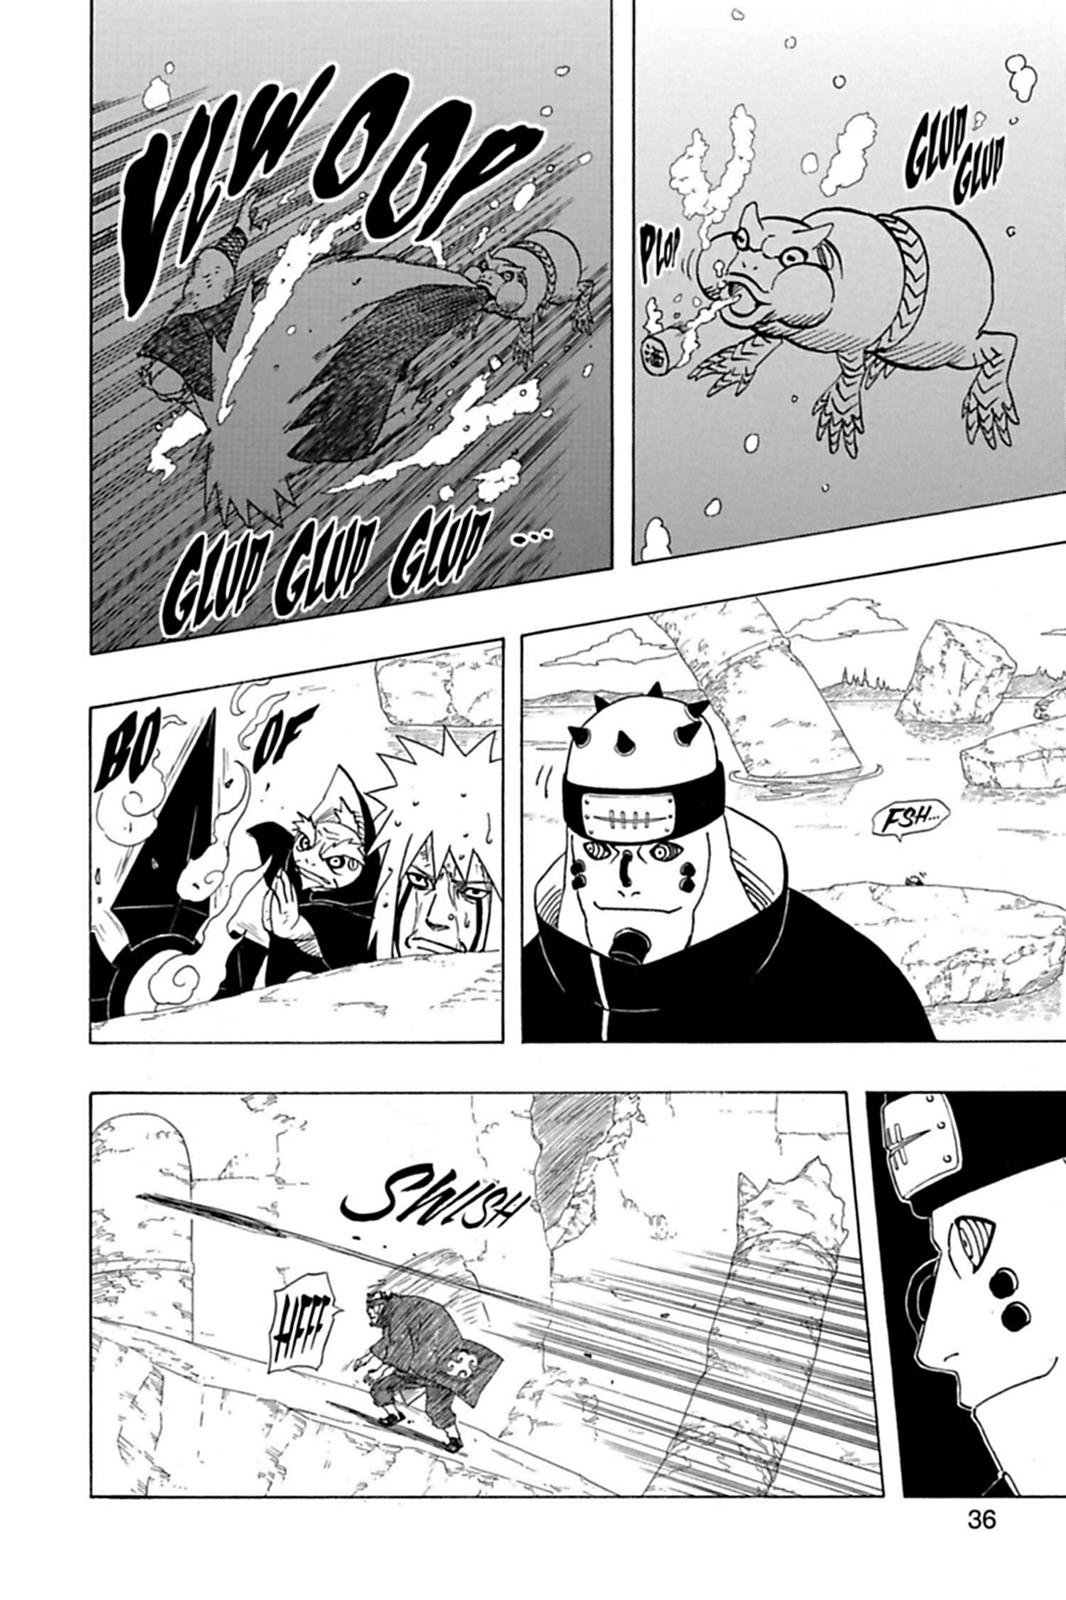 Hiruzen No auge era superior a quase todos da Akatsuki ?? - Página 2 0381-012